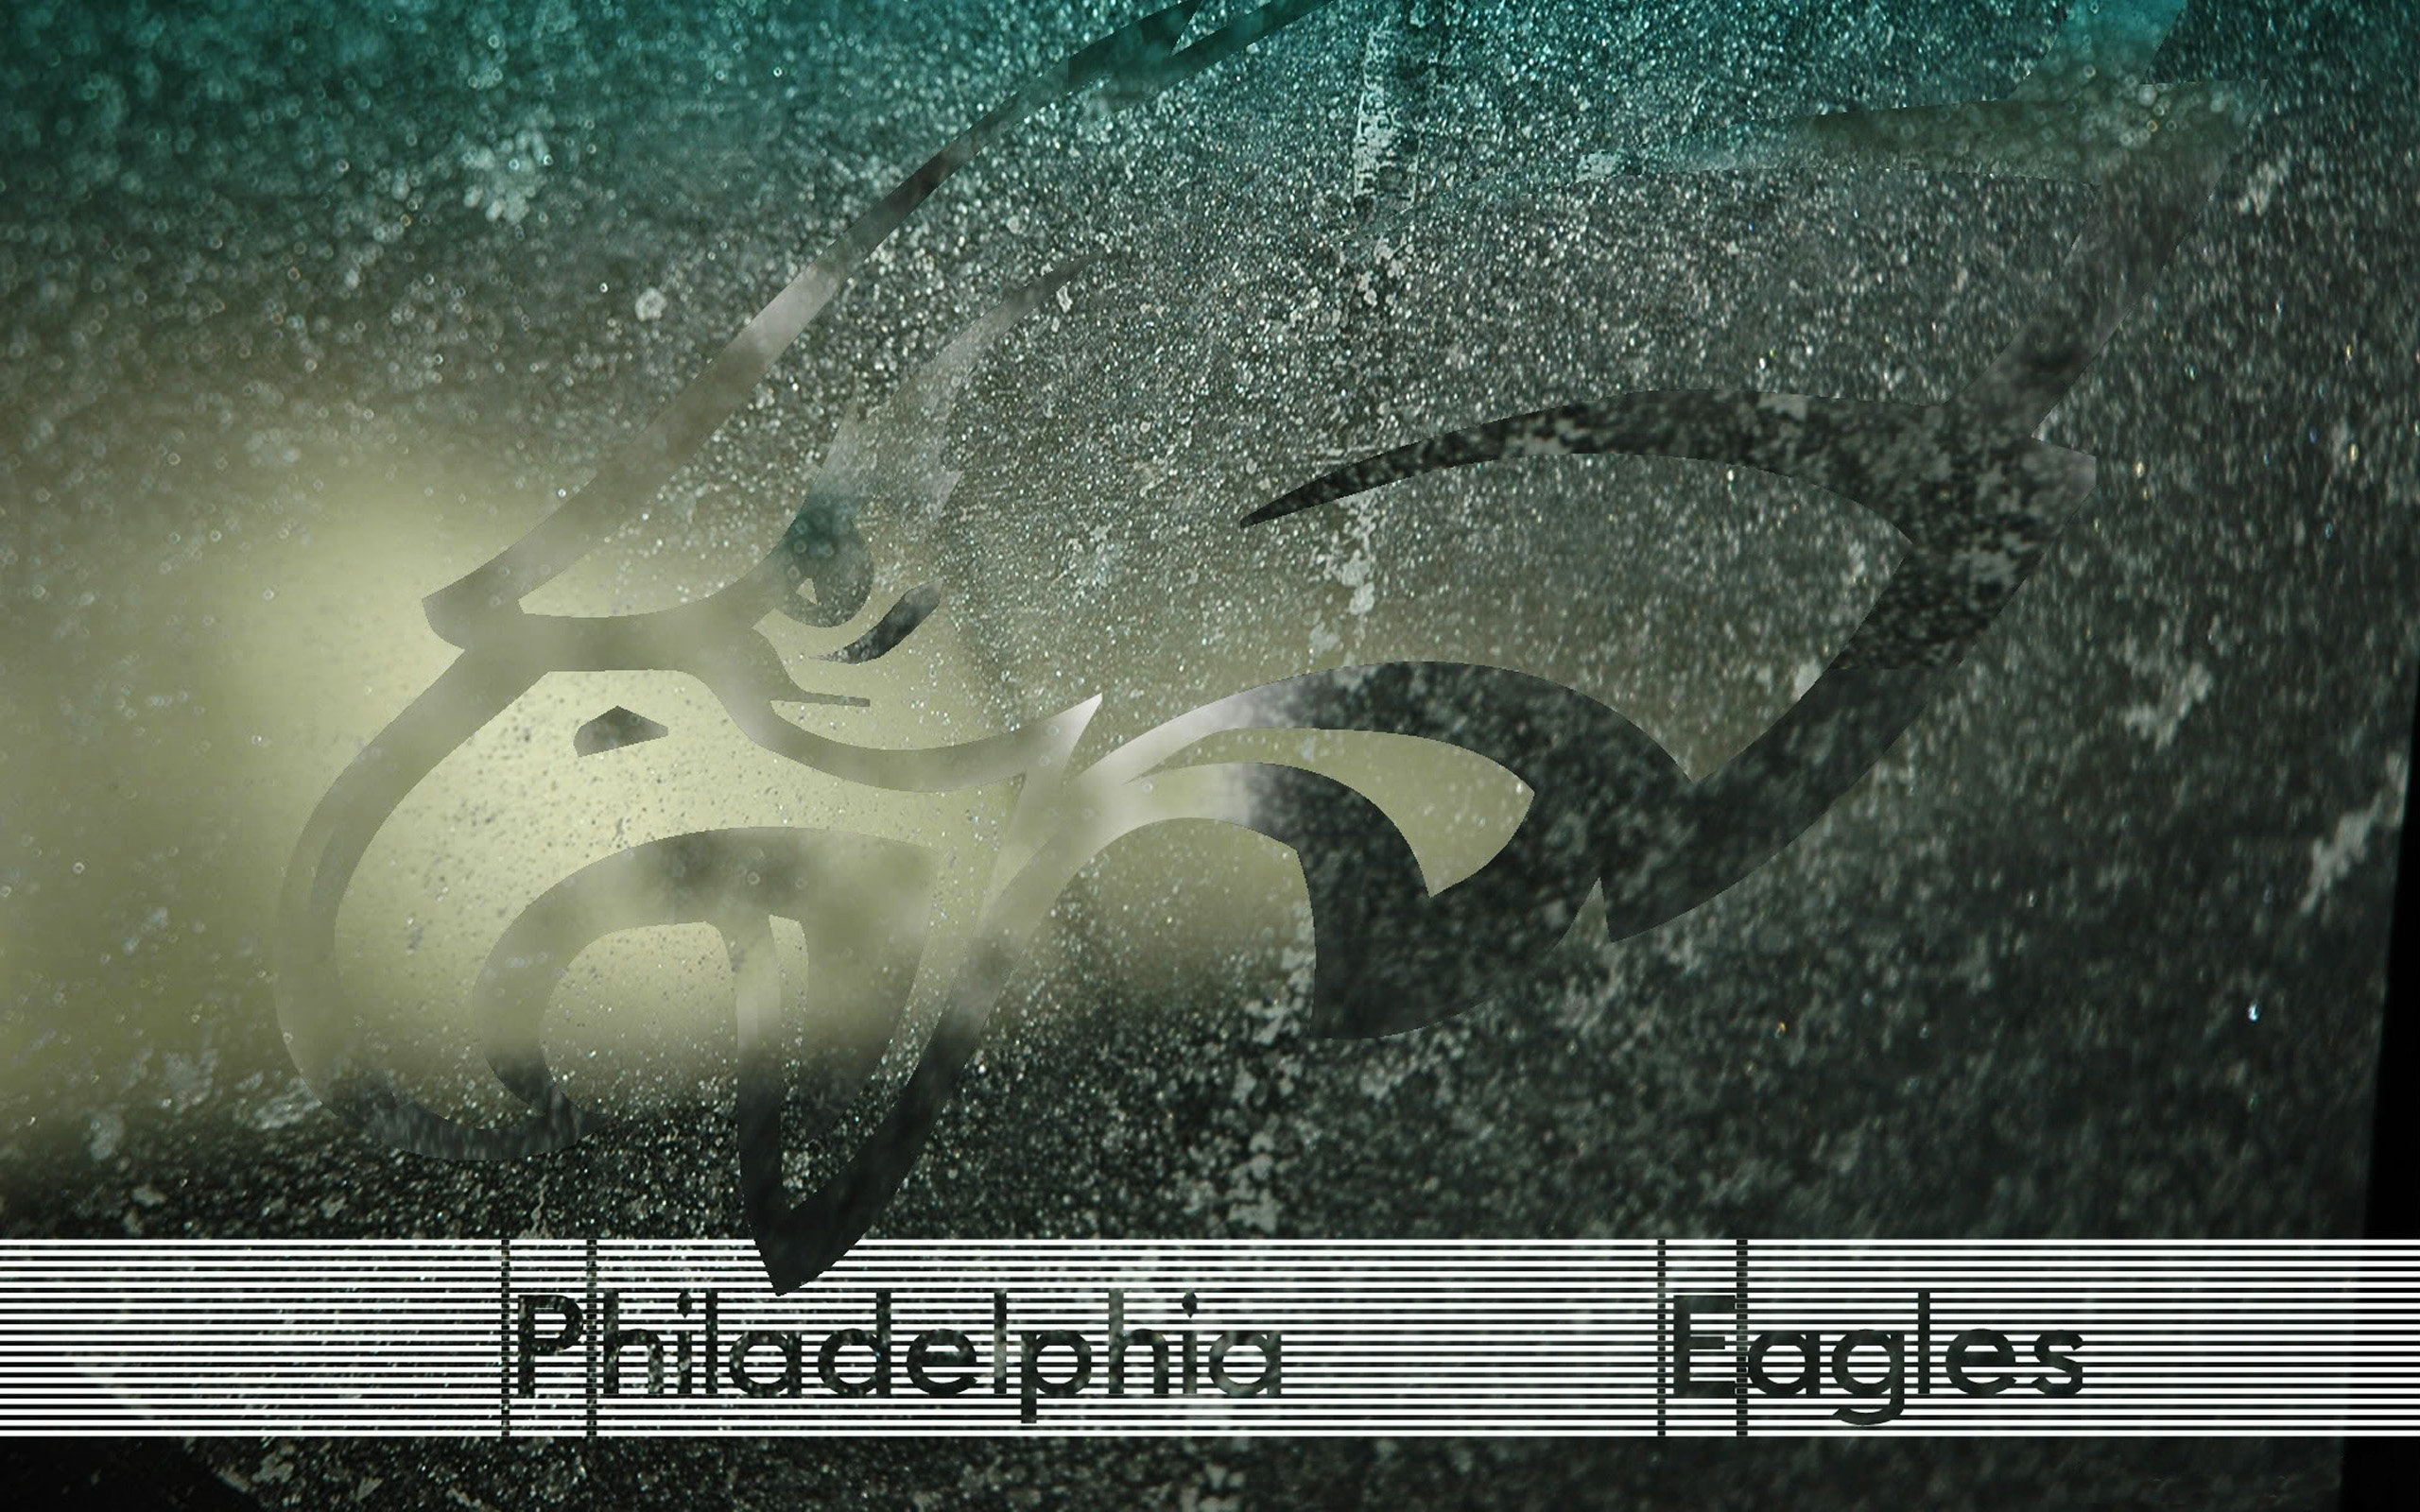 Philadelphia Eagles wallpapers HD for